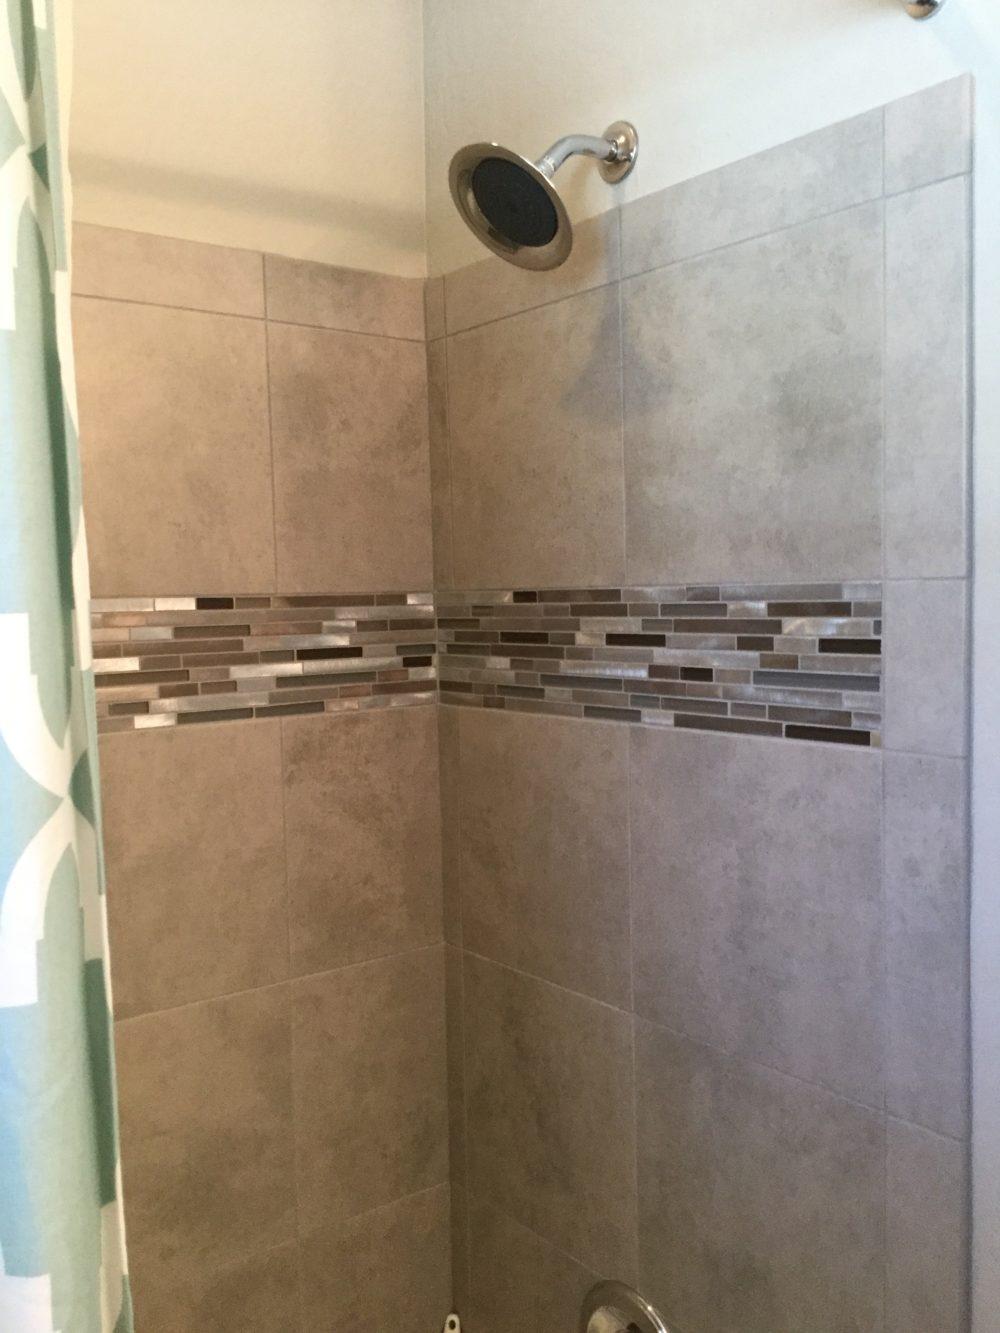 Spare shower